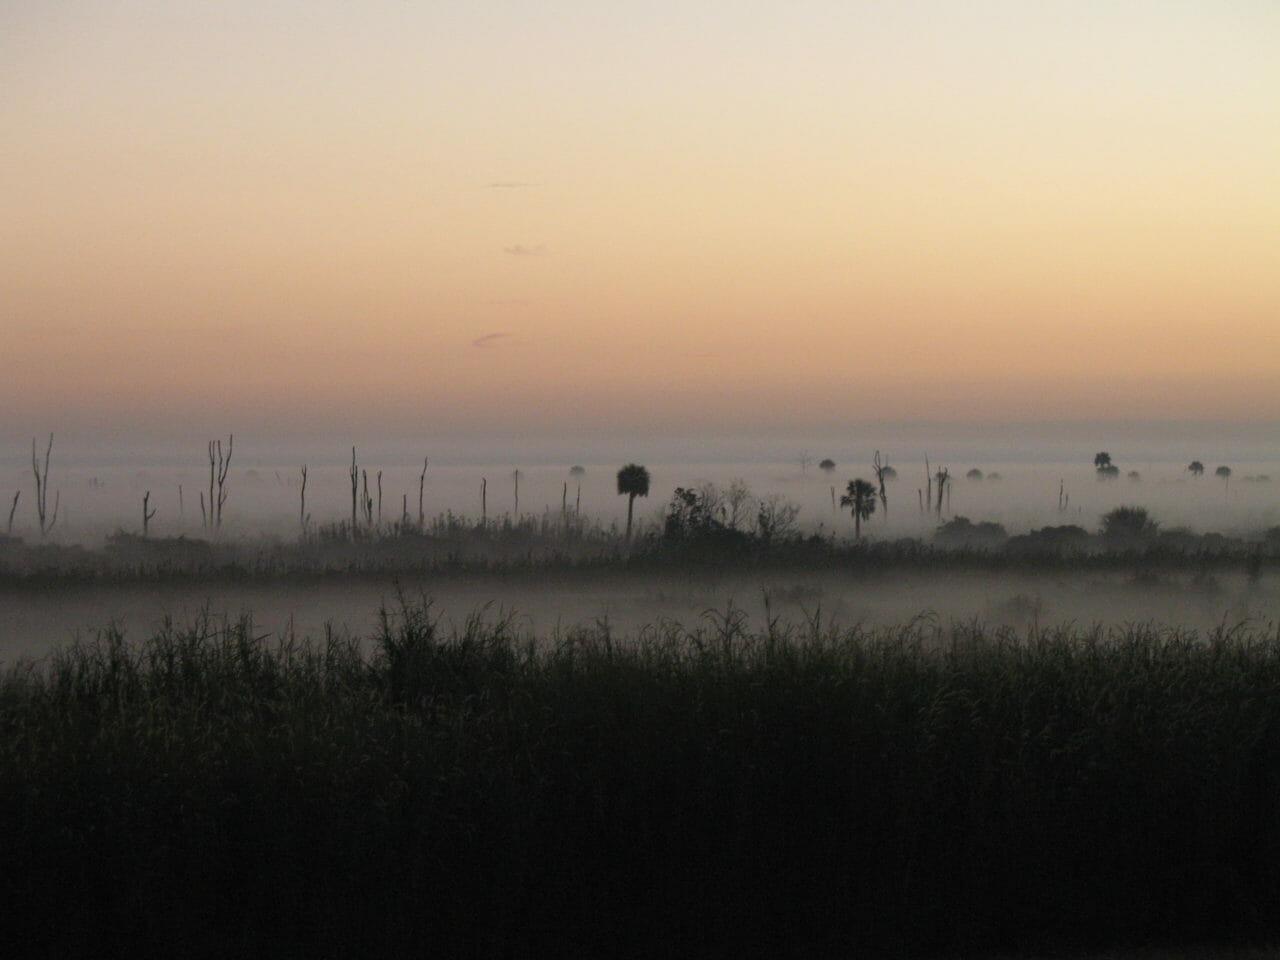 Misty morning on Lake Okeechobee